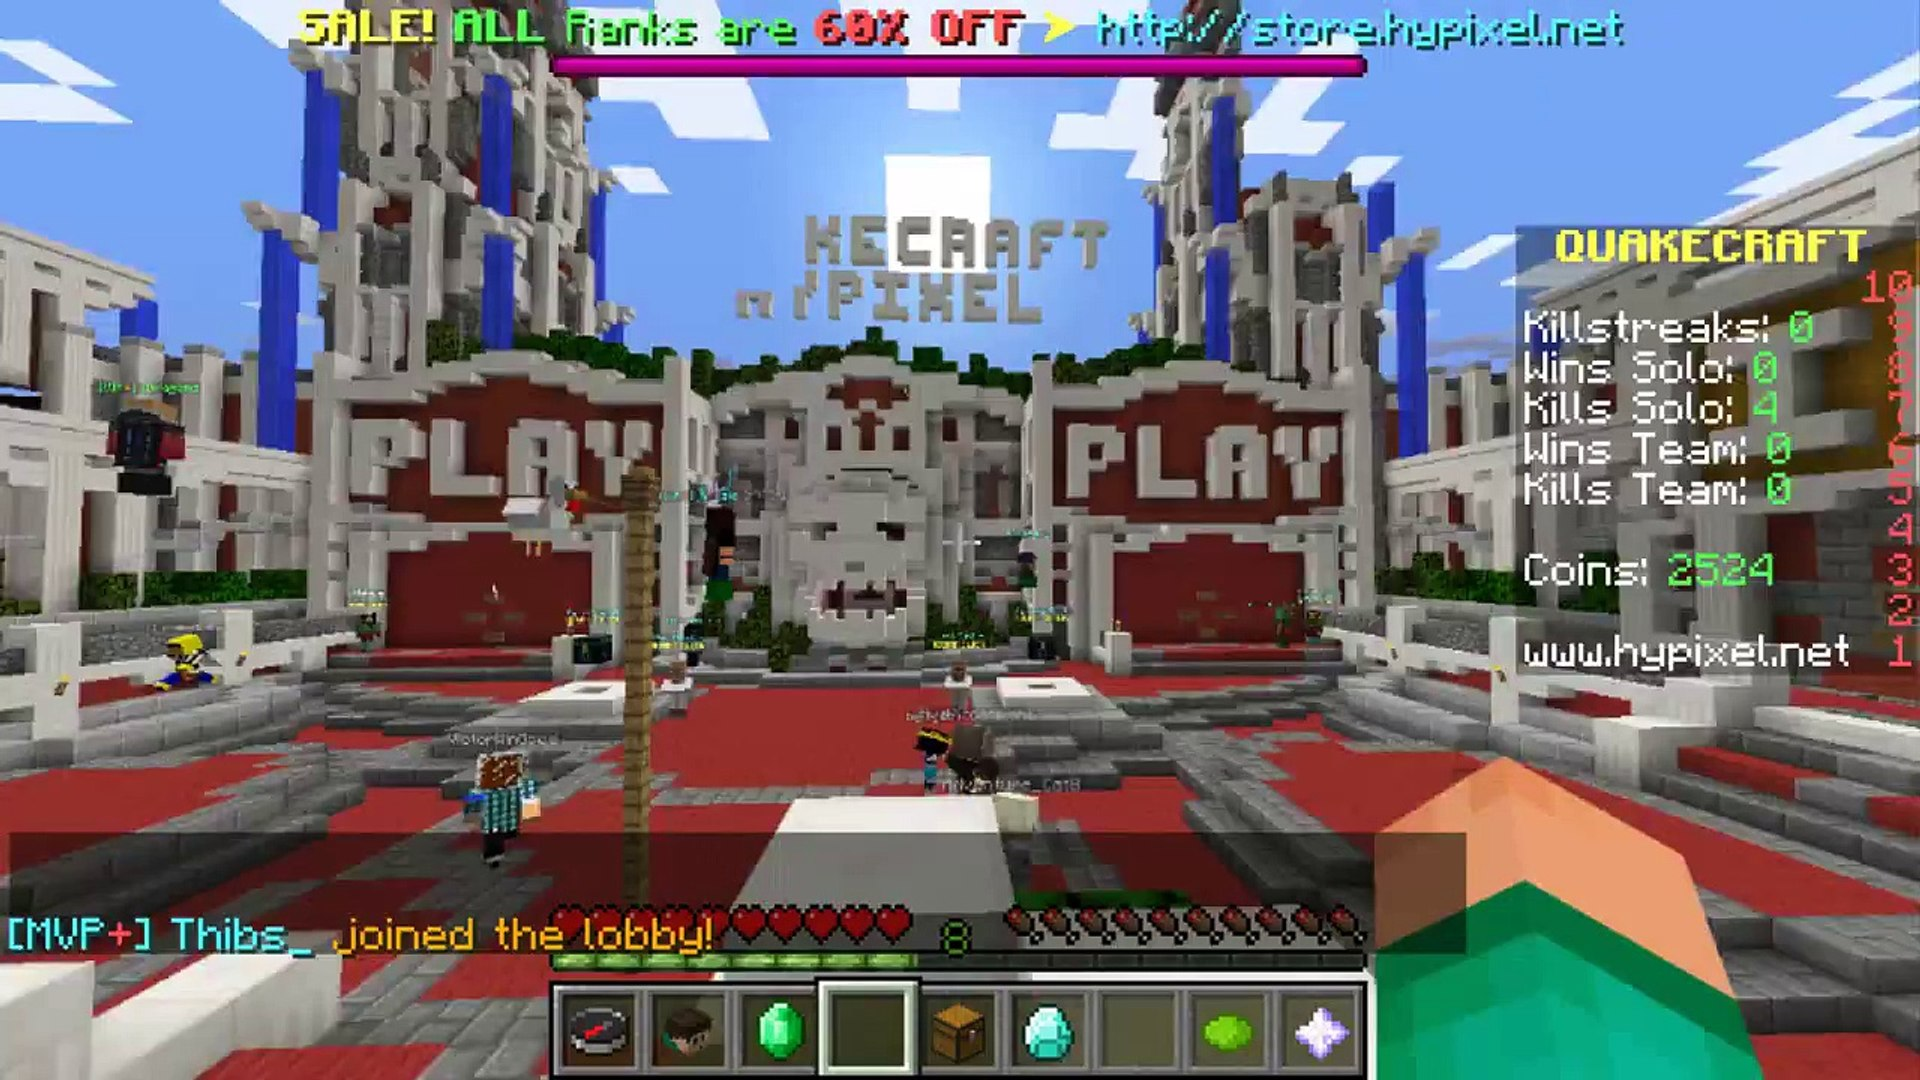 Minecraft | 10 COOLEST SECRETS IN THE HYPIXEL LOBBIES